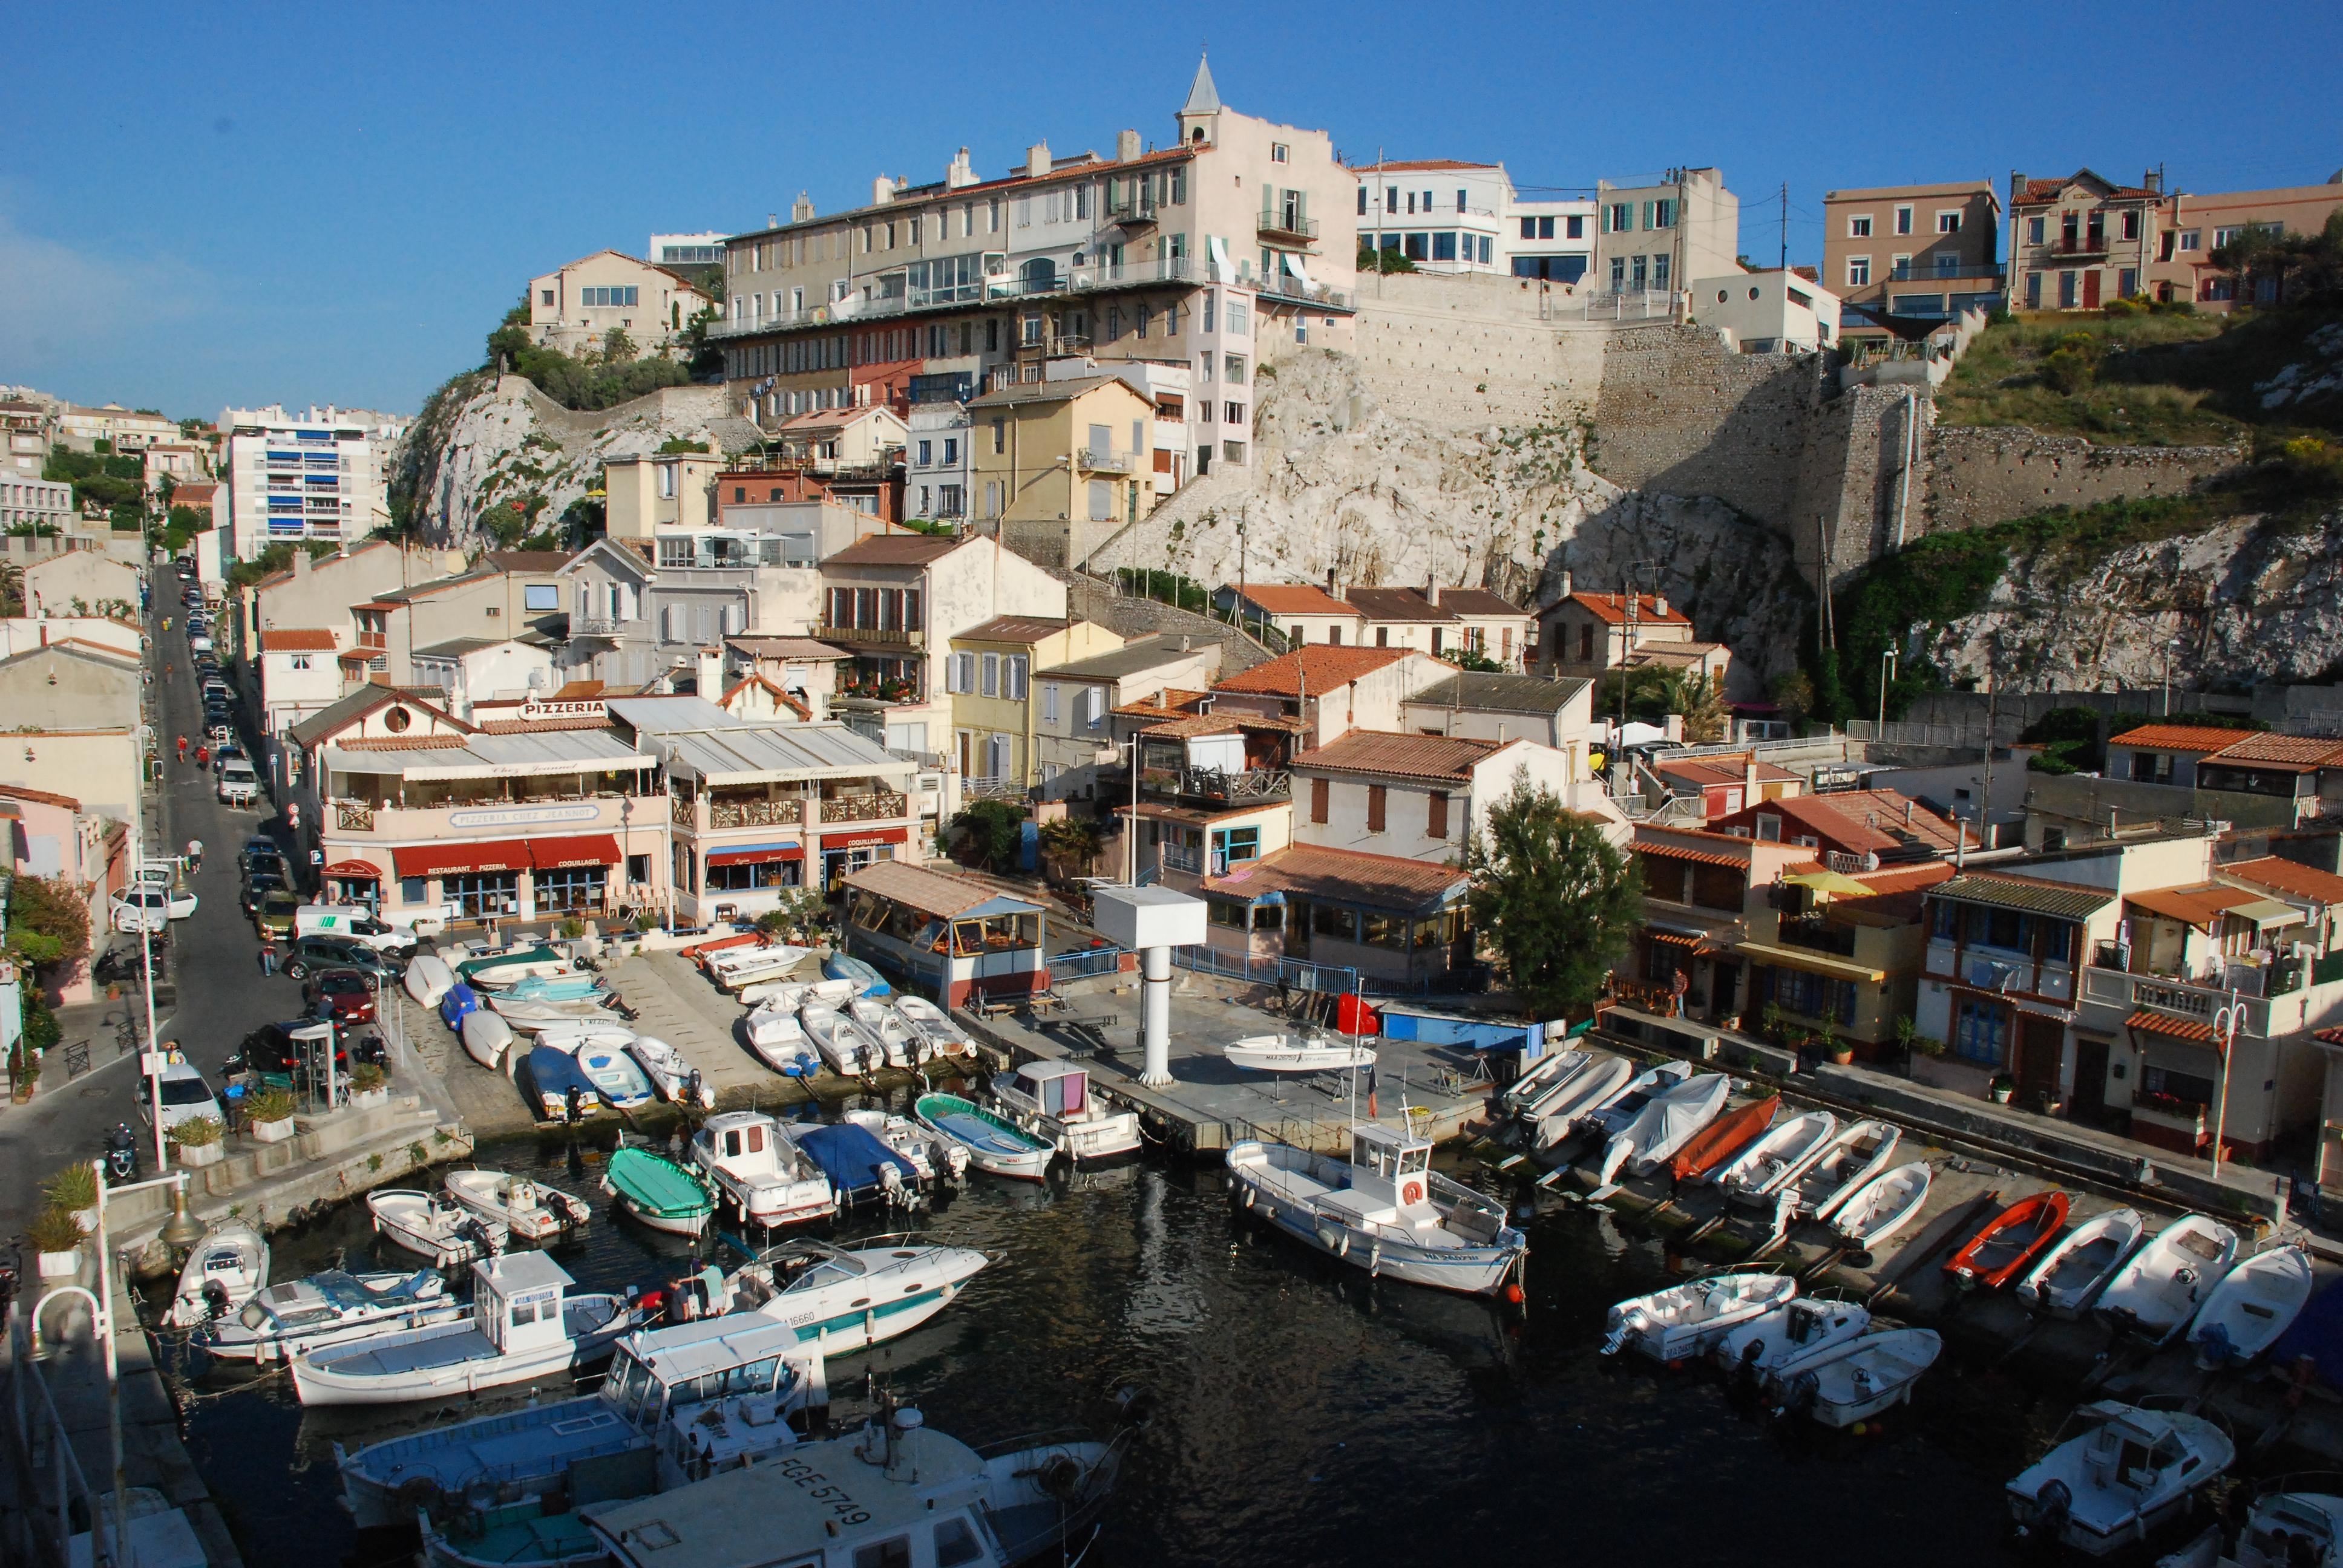 le petit nice - marseilles : a michelin guide restaurant - Ecole De Cuisine Marseille